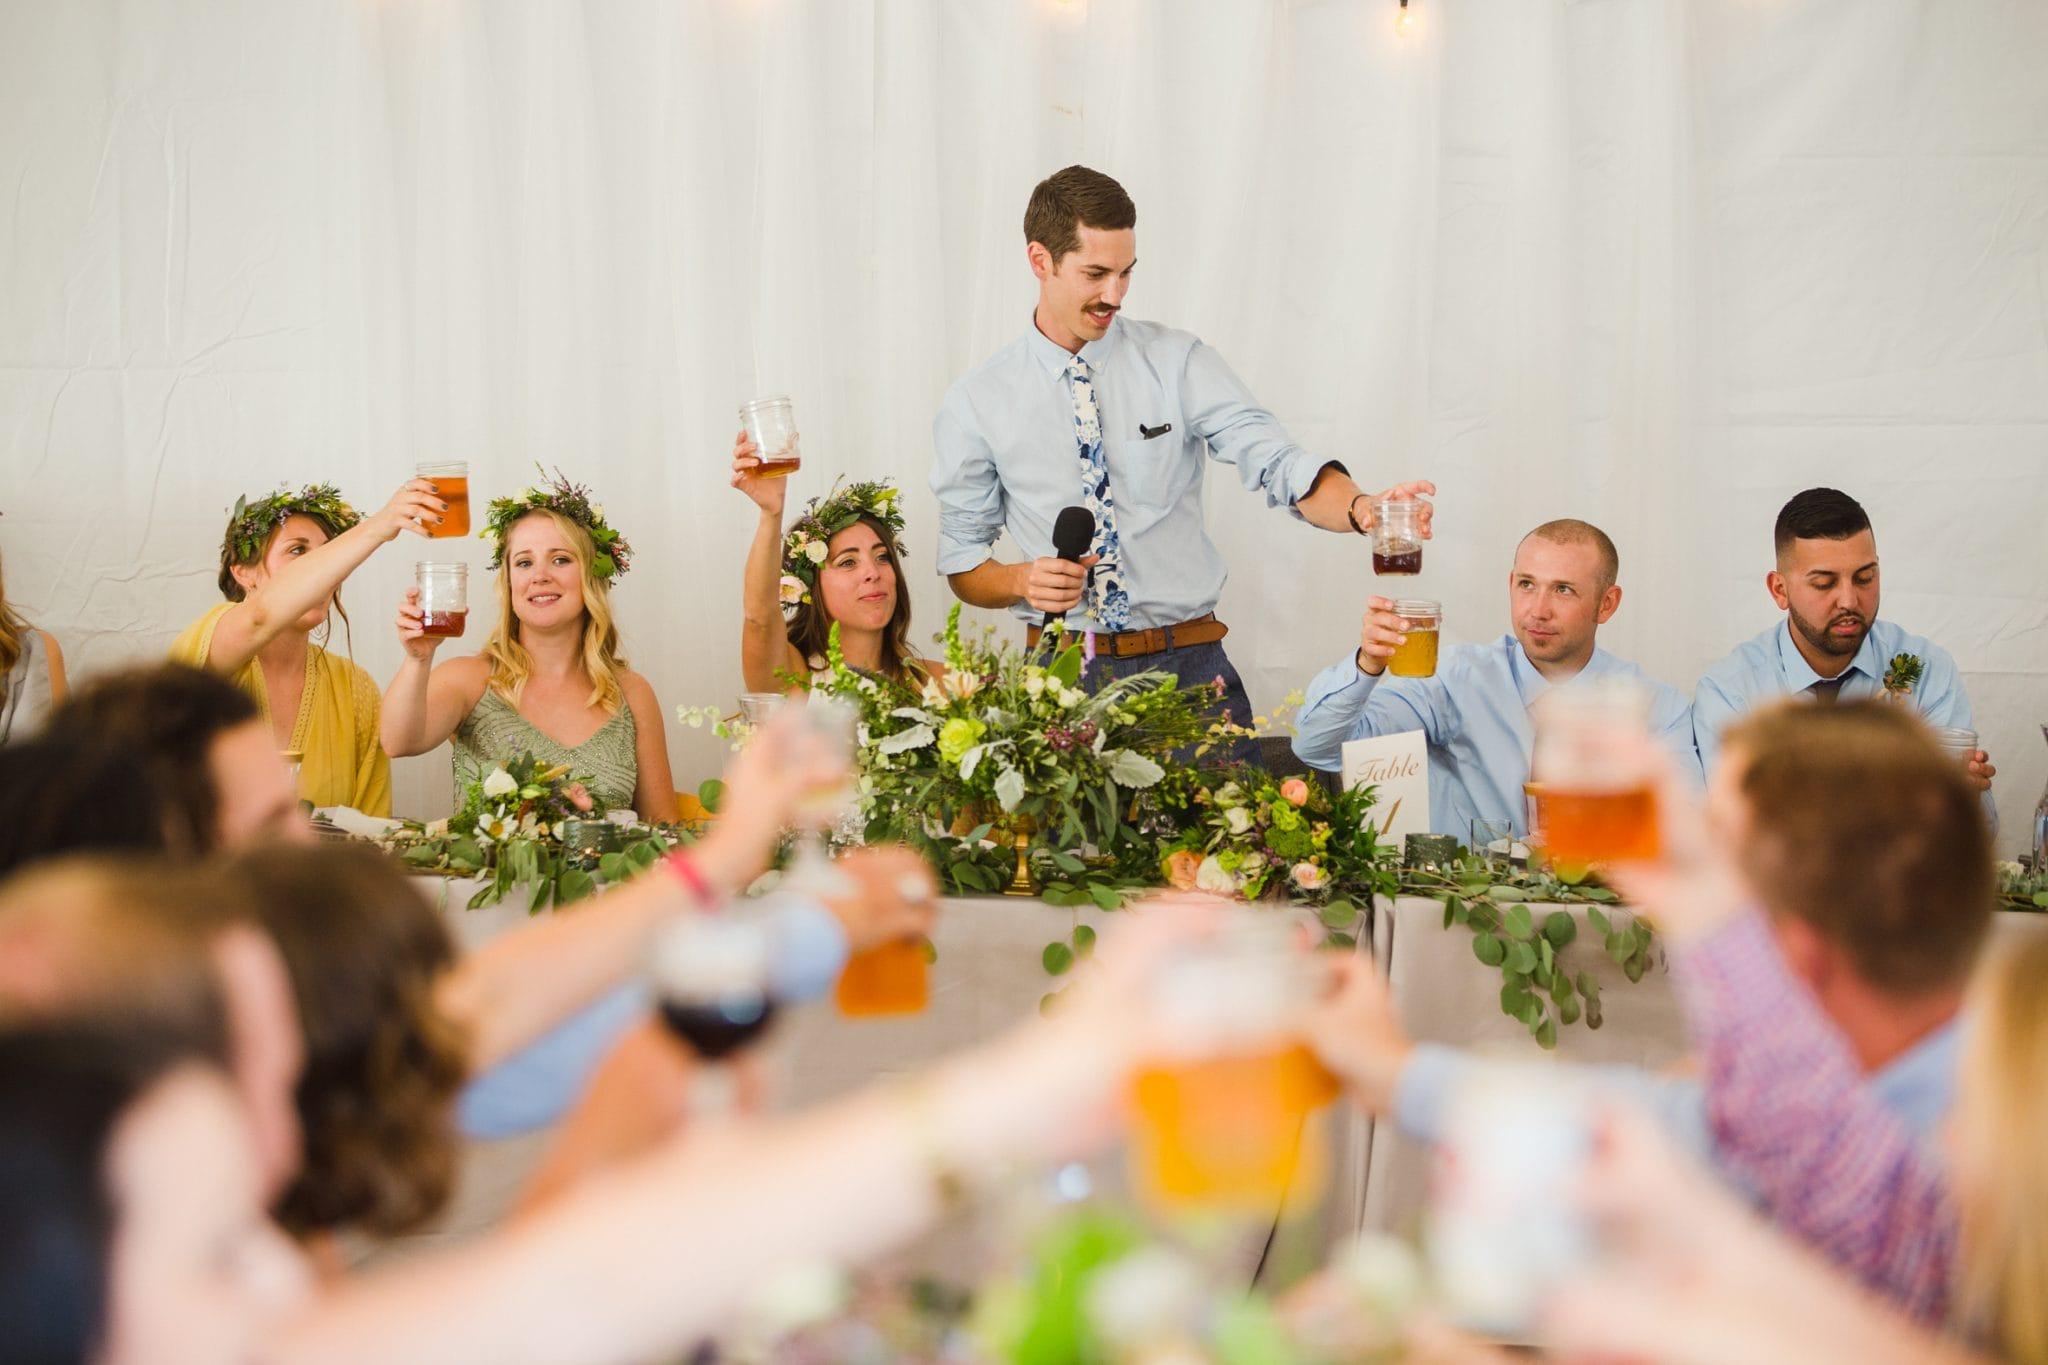 duskin-allison-wedding-674